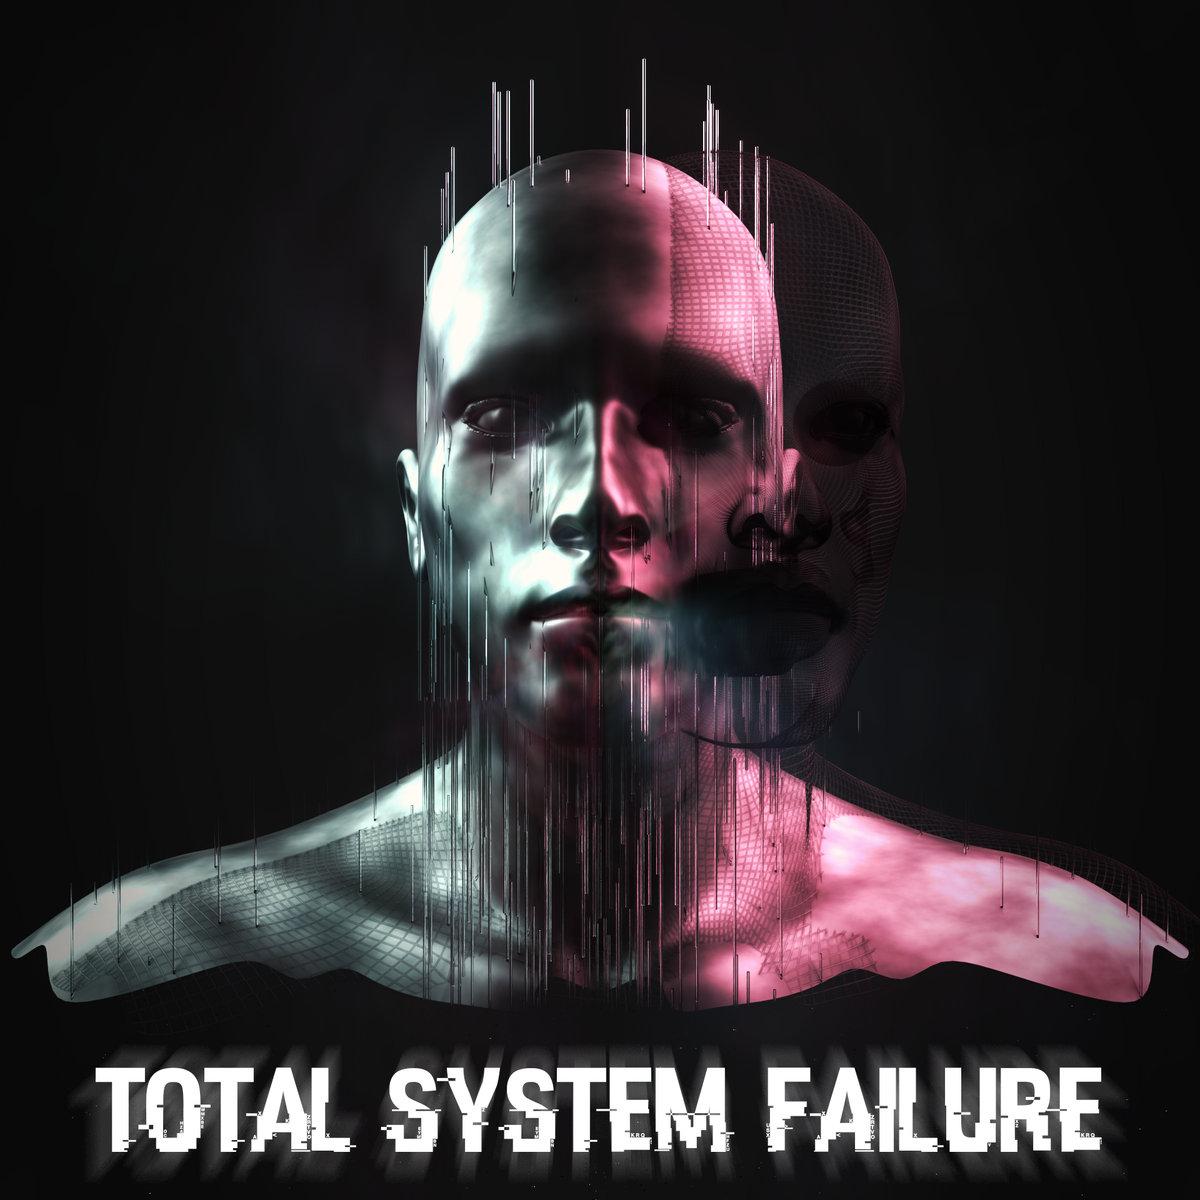 Iamlamprey - Total System Failure [EP] (2018)